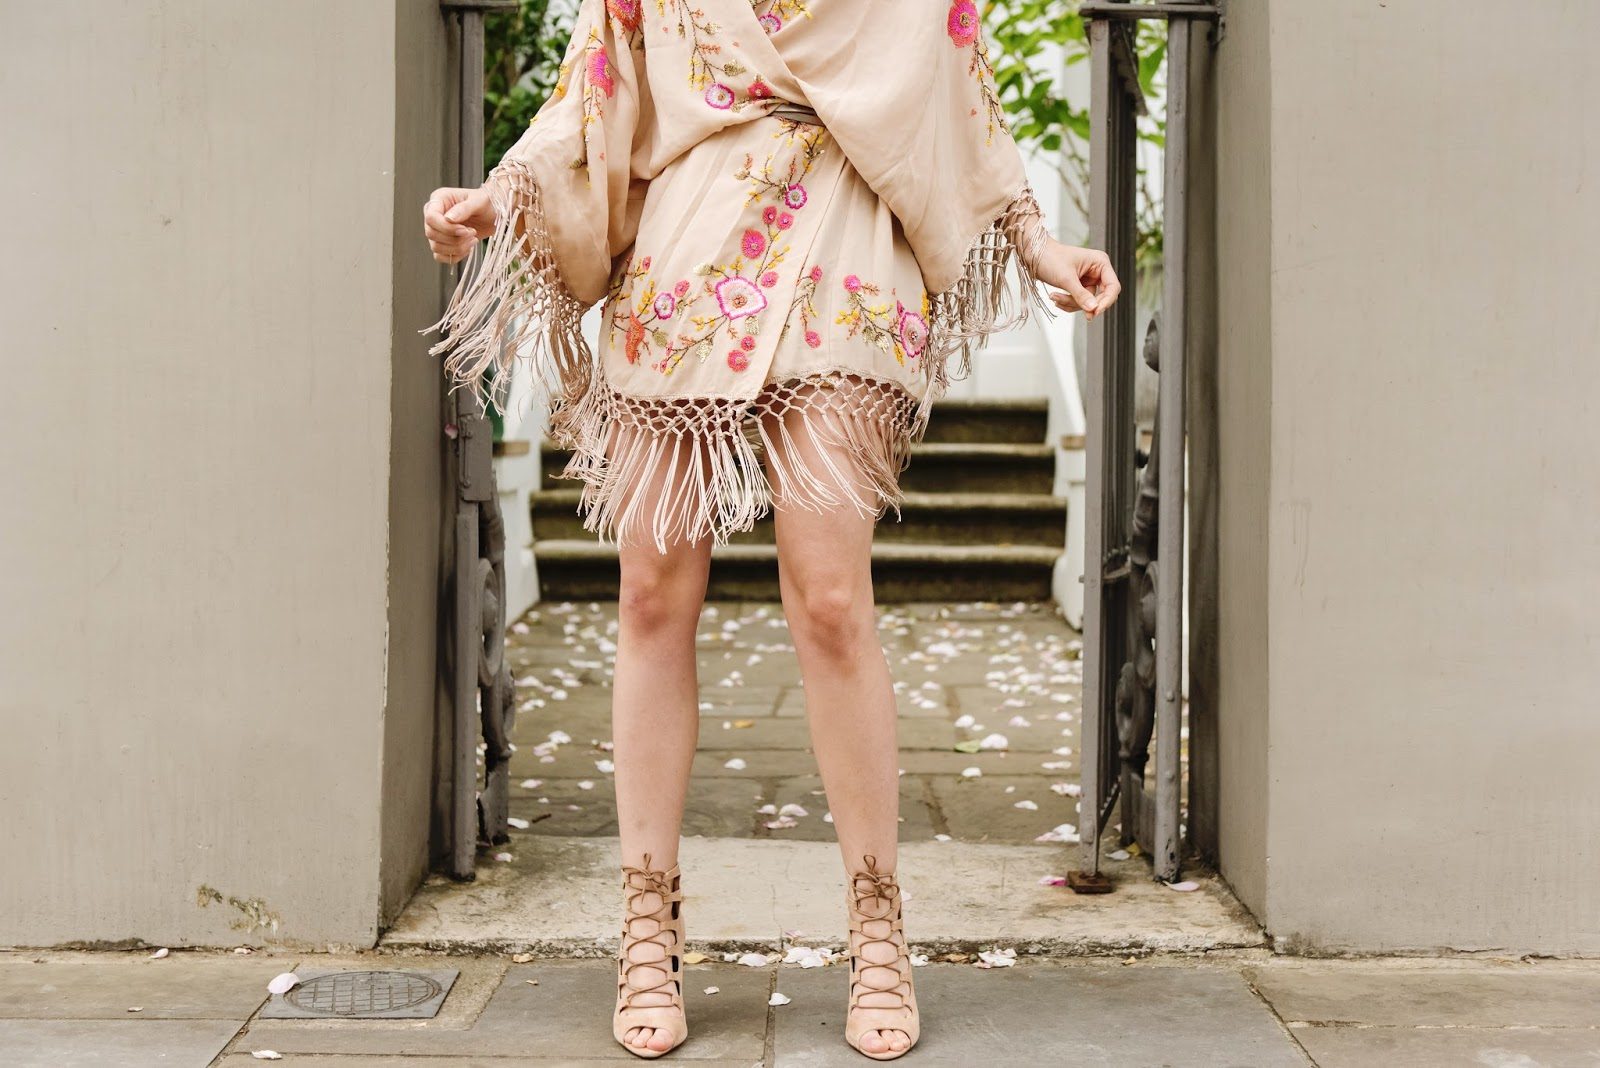 embellished kiono, festival, lace up heels, parisian heels, office shoes, embellished, embroidery, lace up heels, nude heels, office shoes, fringe, tassels